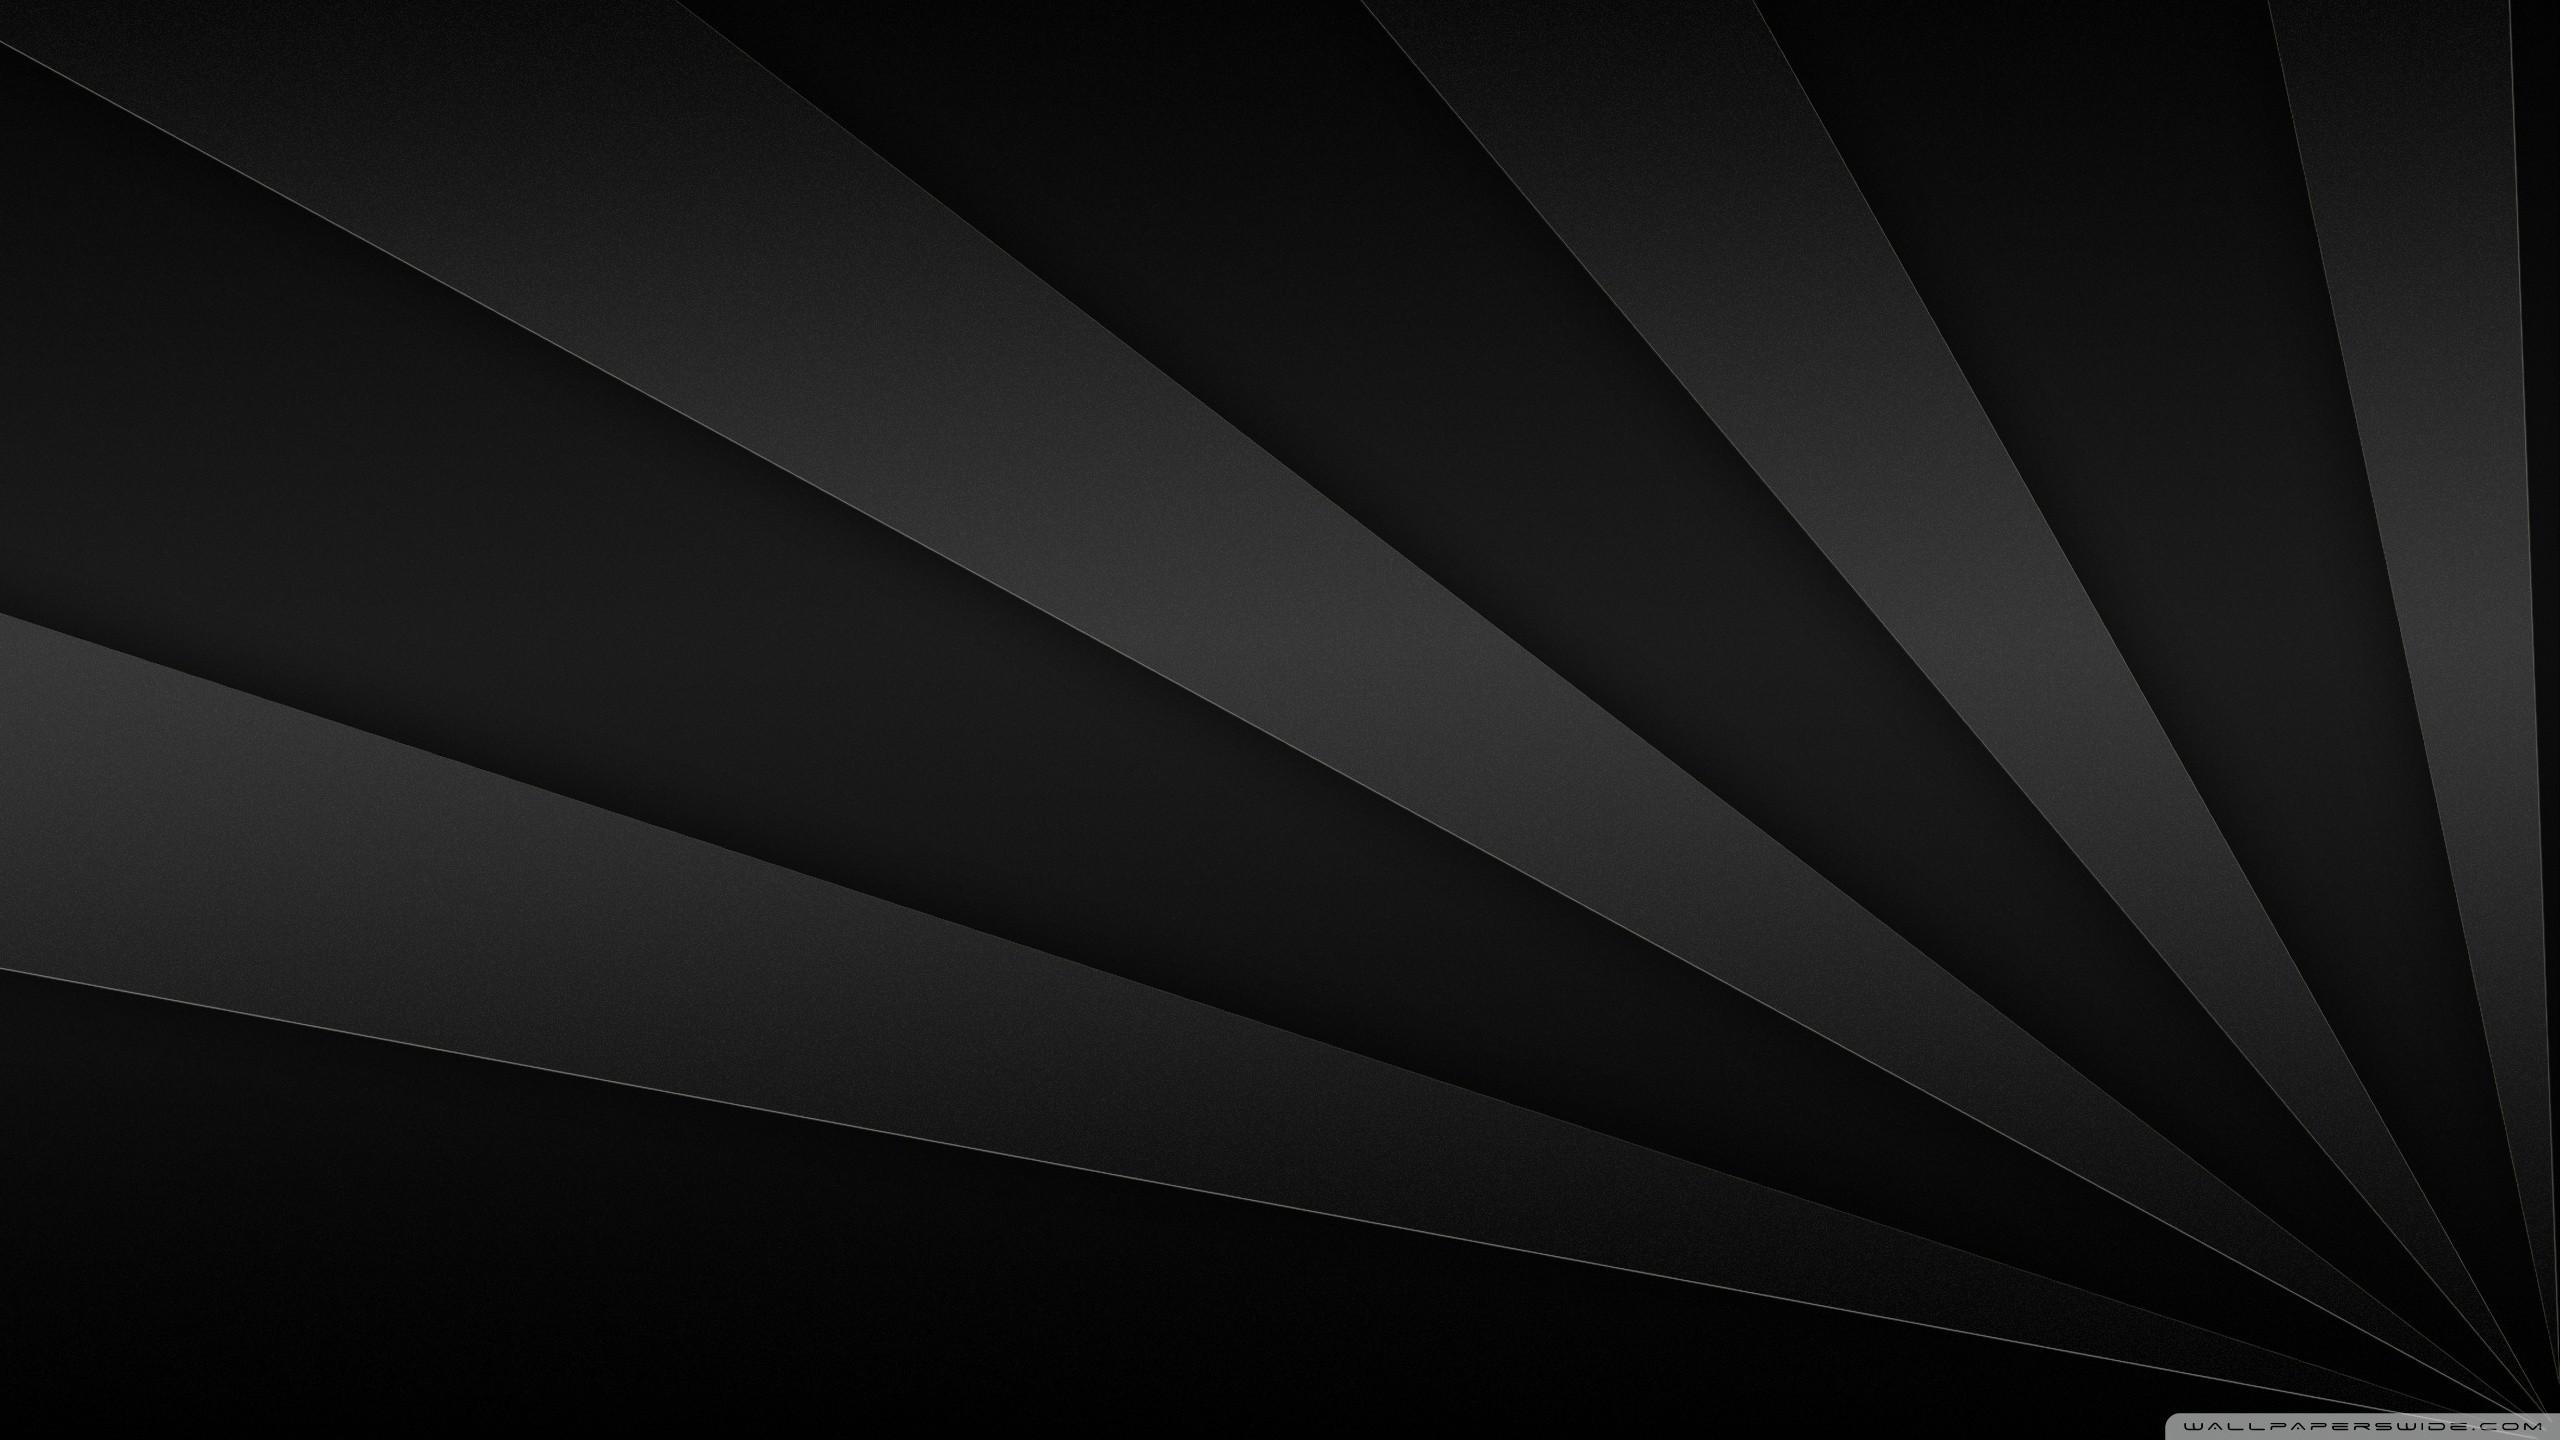 <b>2560 x 1440 Wallpaper Black</b> – WallpaperSafari